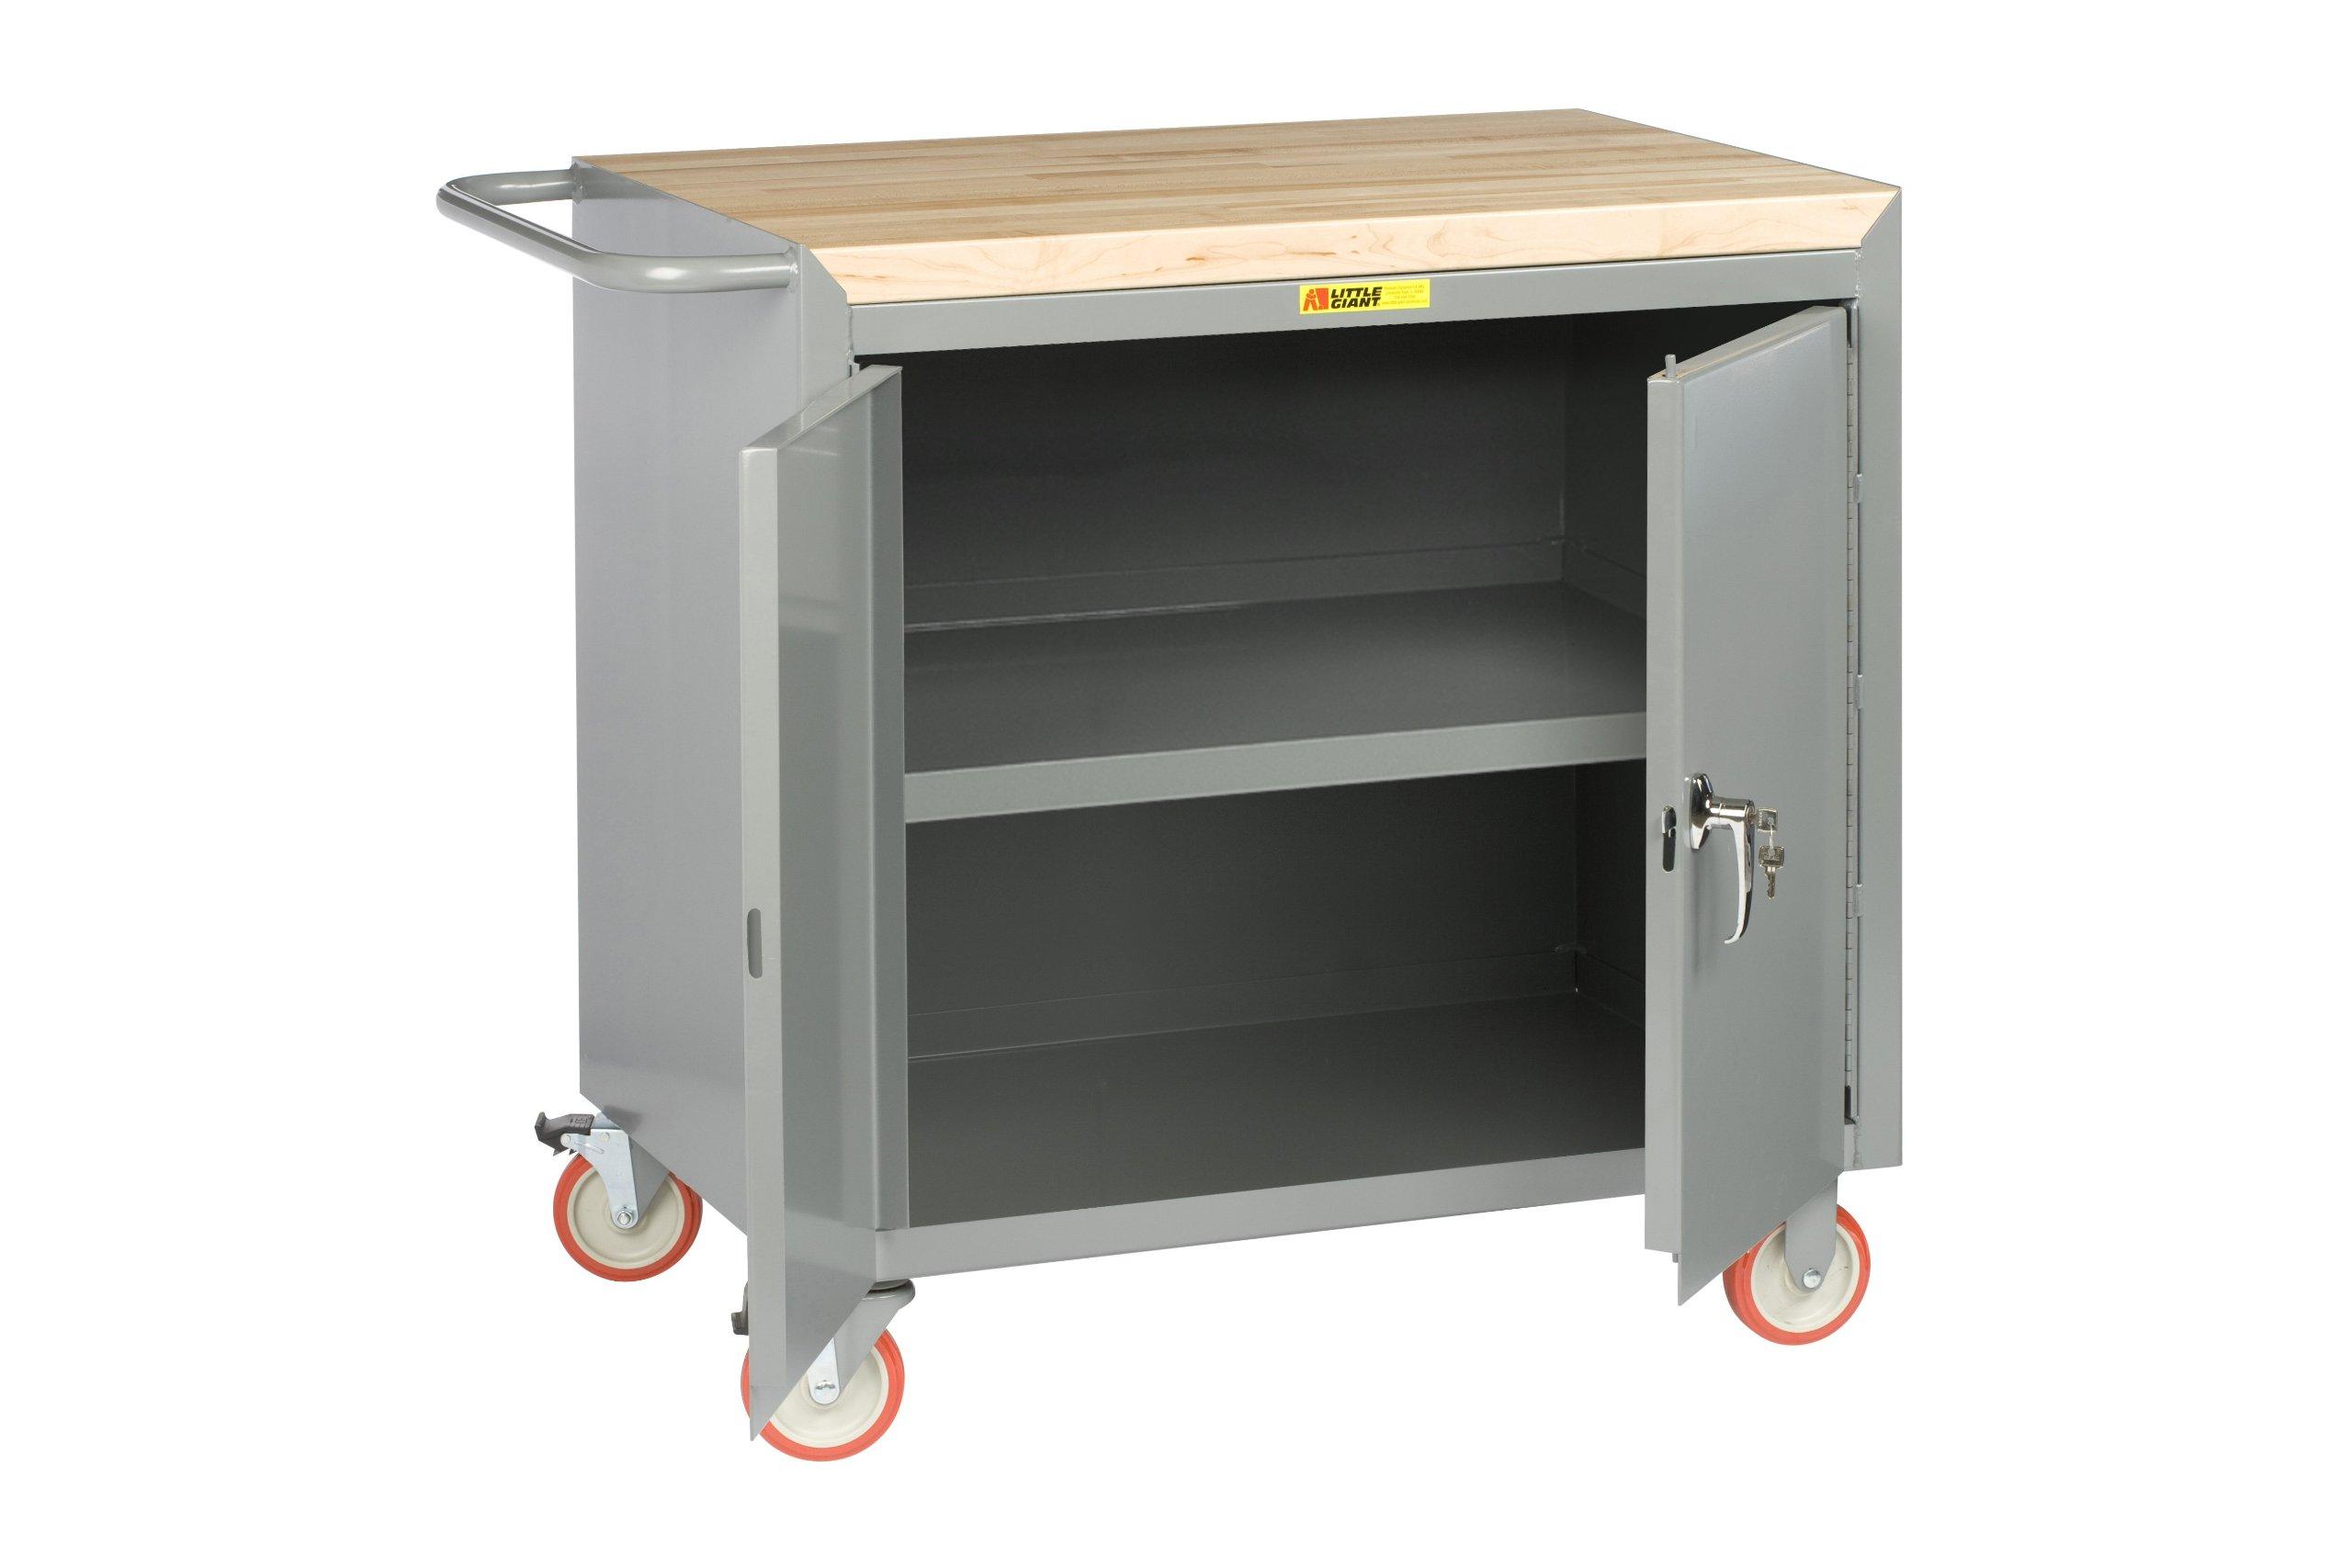 Little Giant MCJ3-2D-2436-TL 14 Gauge Steel Locking Doors Mobile Bench Cabinet with Center Shelf and 1-3/4'' Butcher Block Top, 1200 lbs Capacity, 36'' Width x 24'' Depth